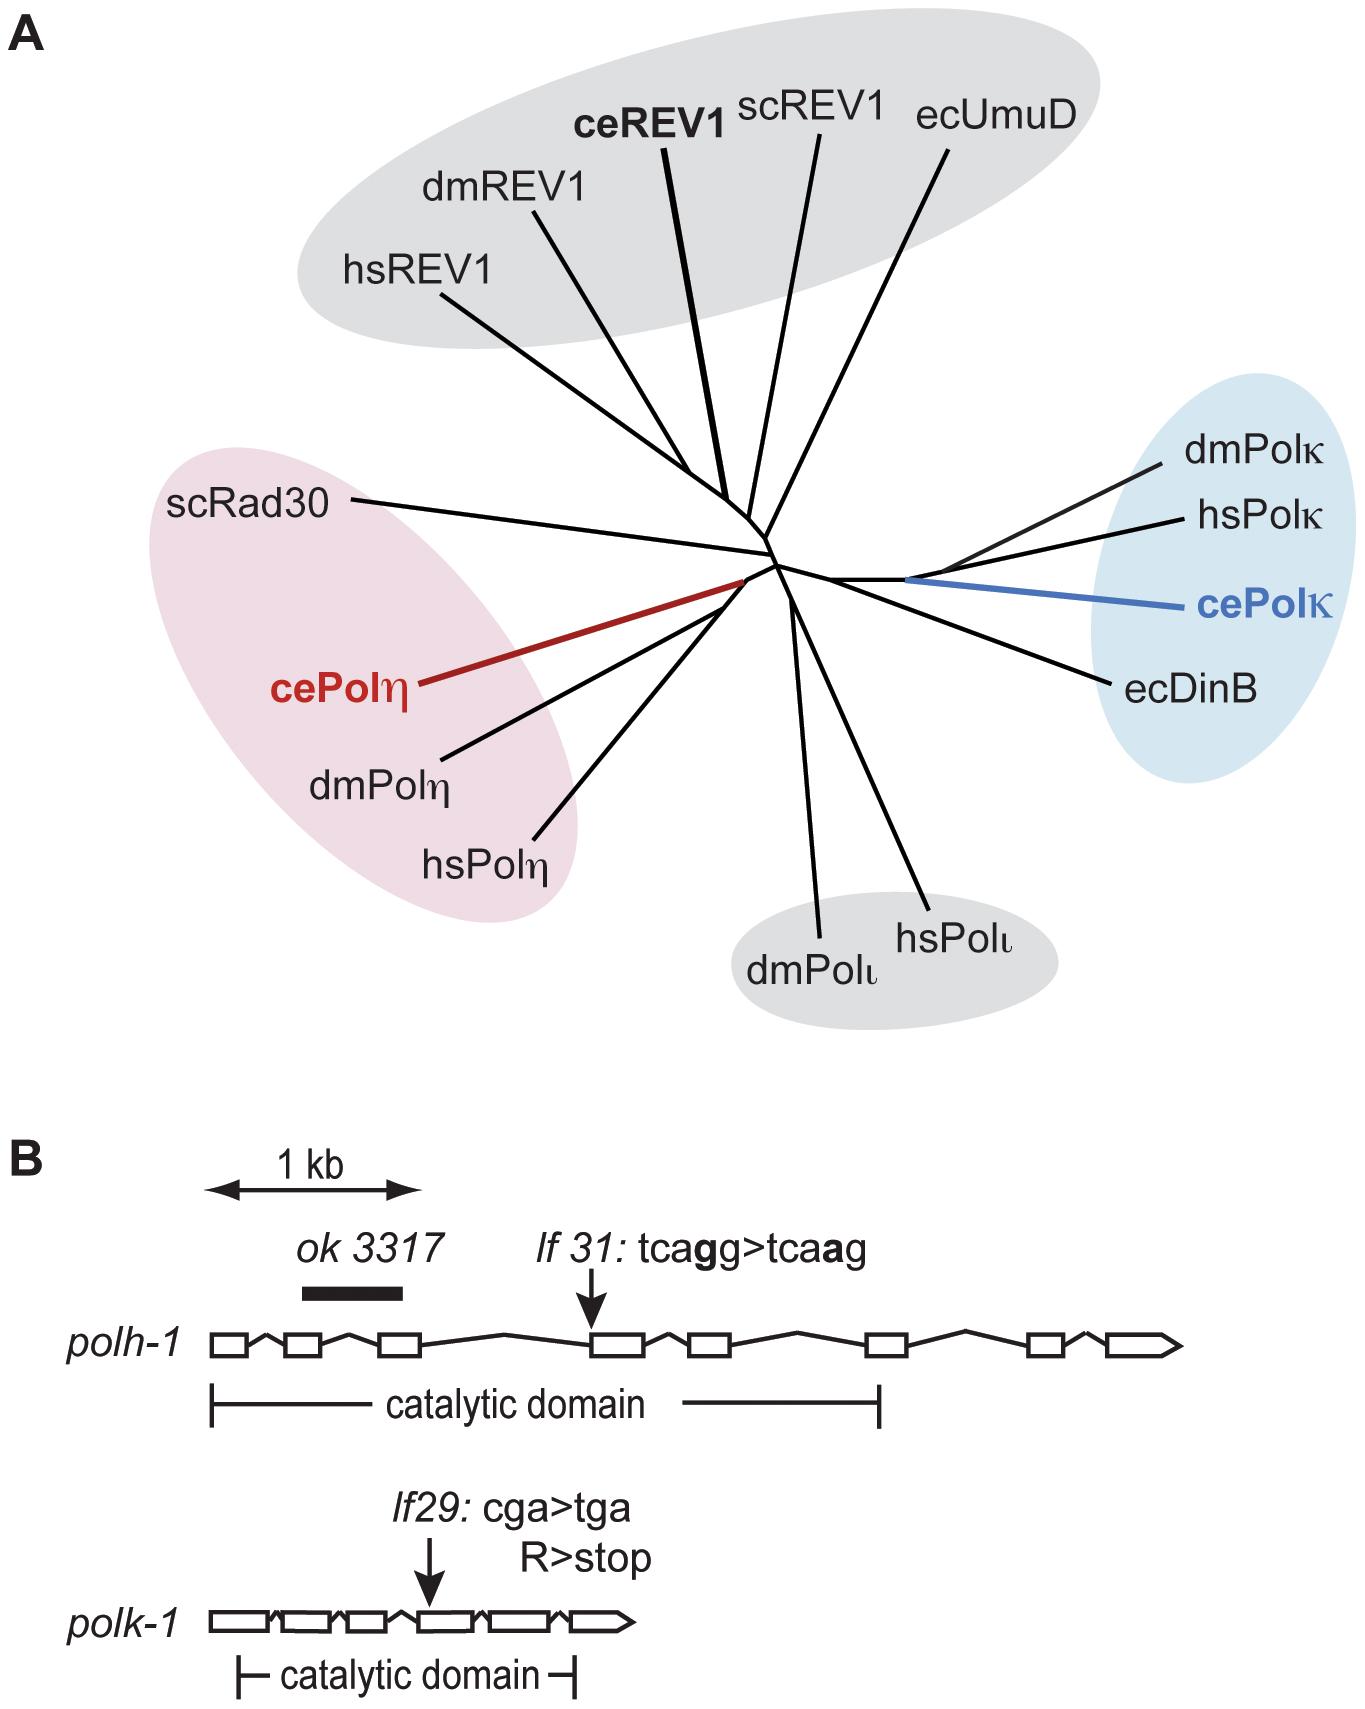 Y-family polymerases POLH-1 and POLK-1 of <i>C. elegans</i>.